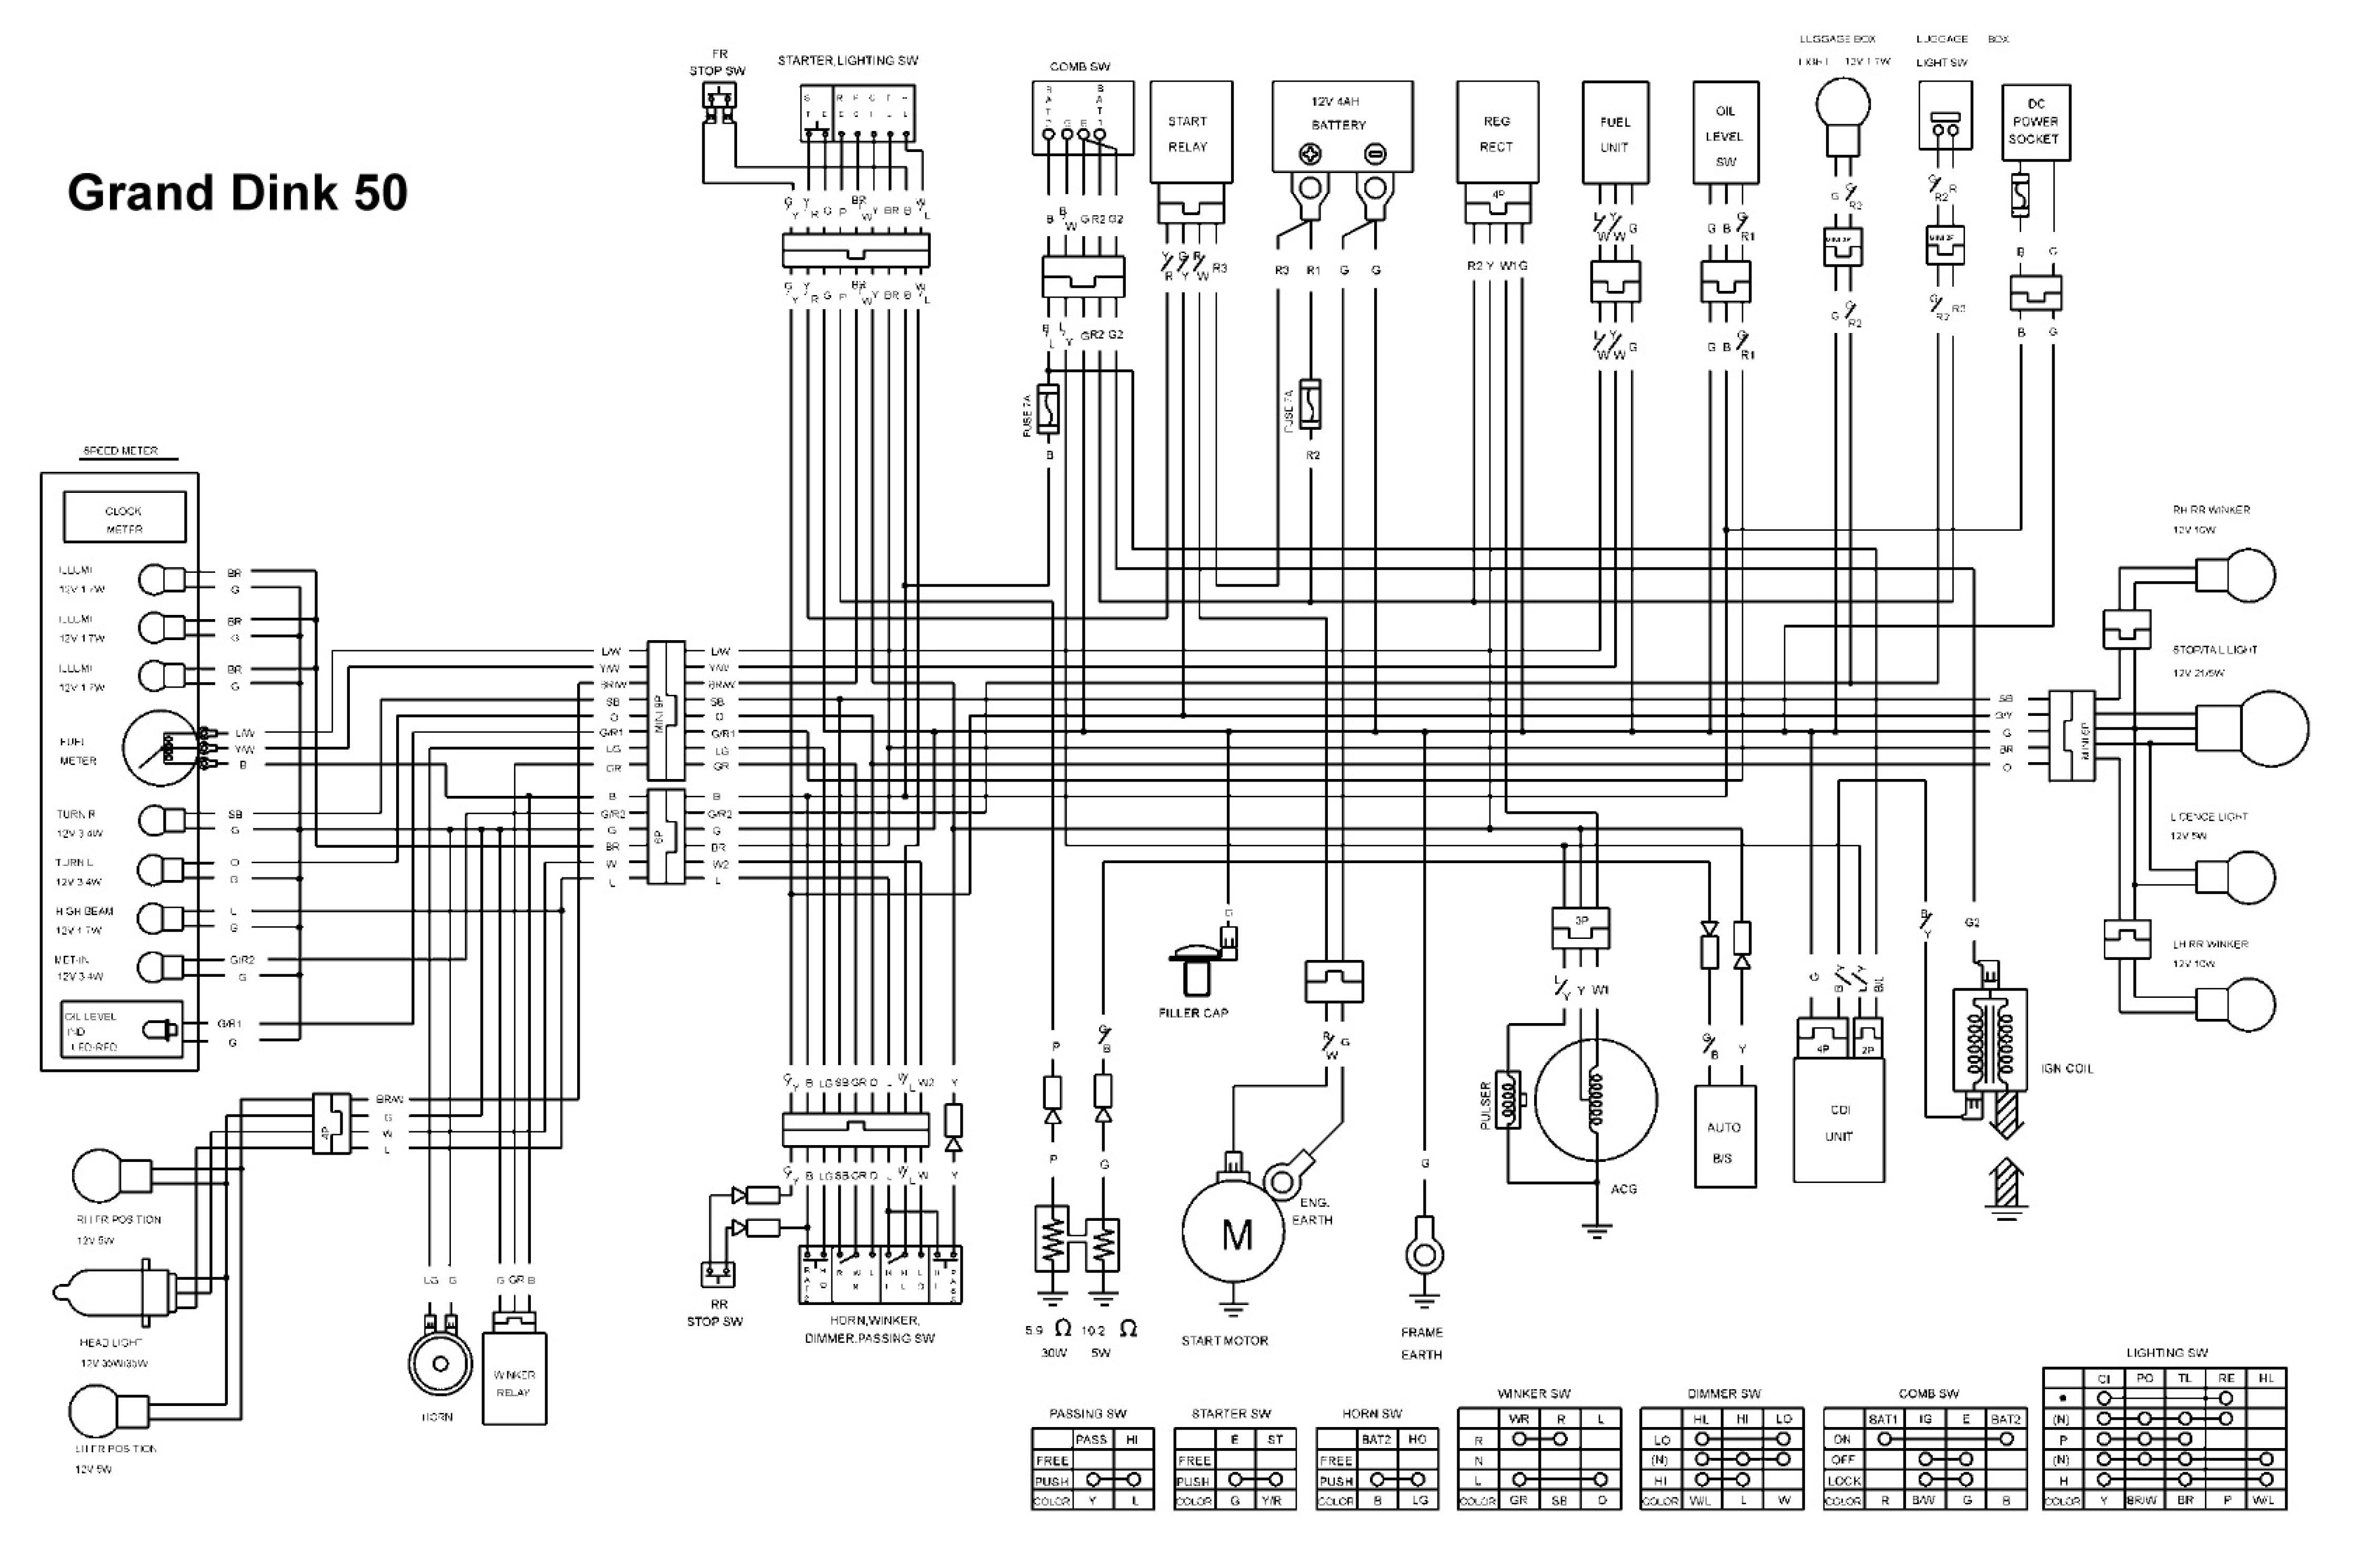 Polaris Cdi Ignition Wiring Diagram As Well 2000 Polaris Fuel Line